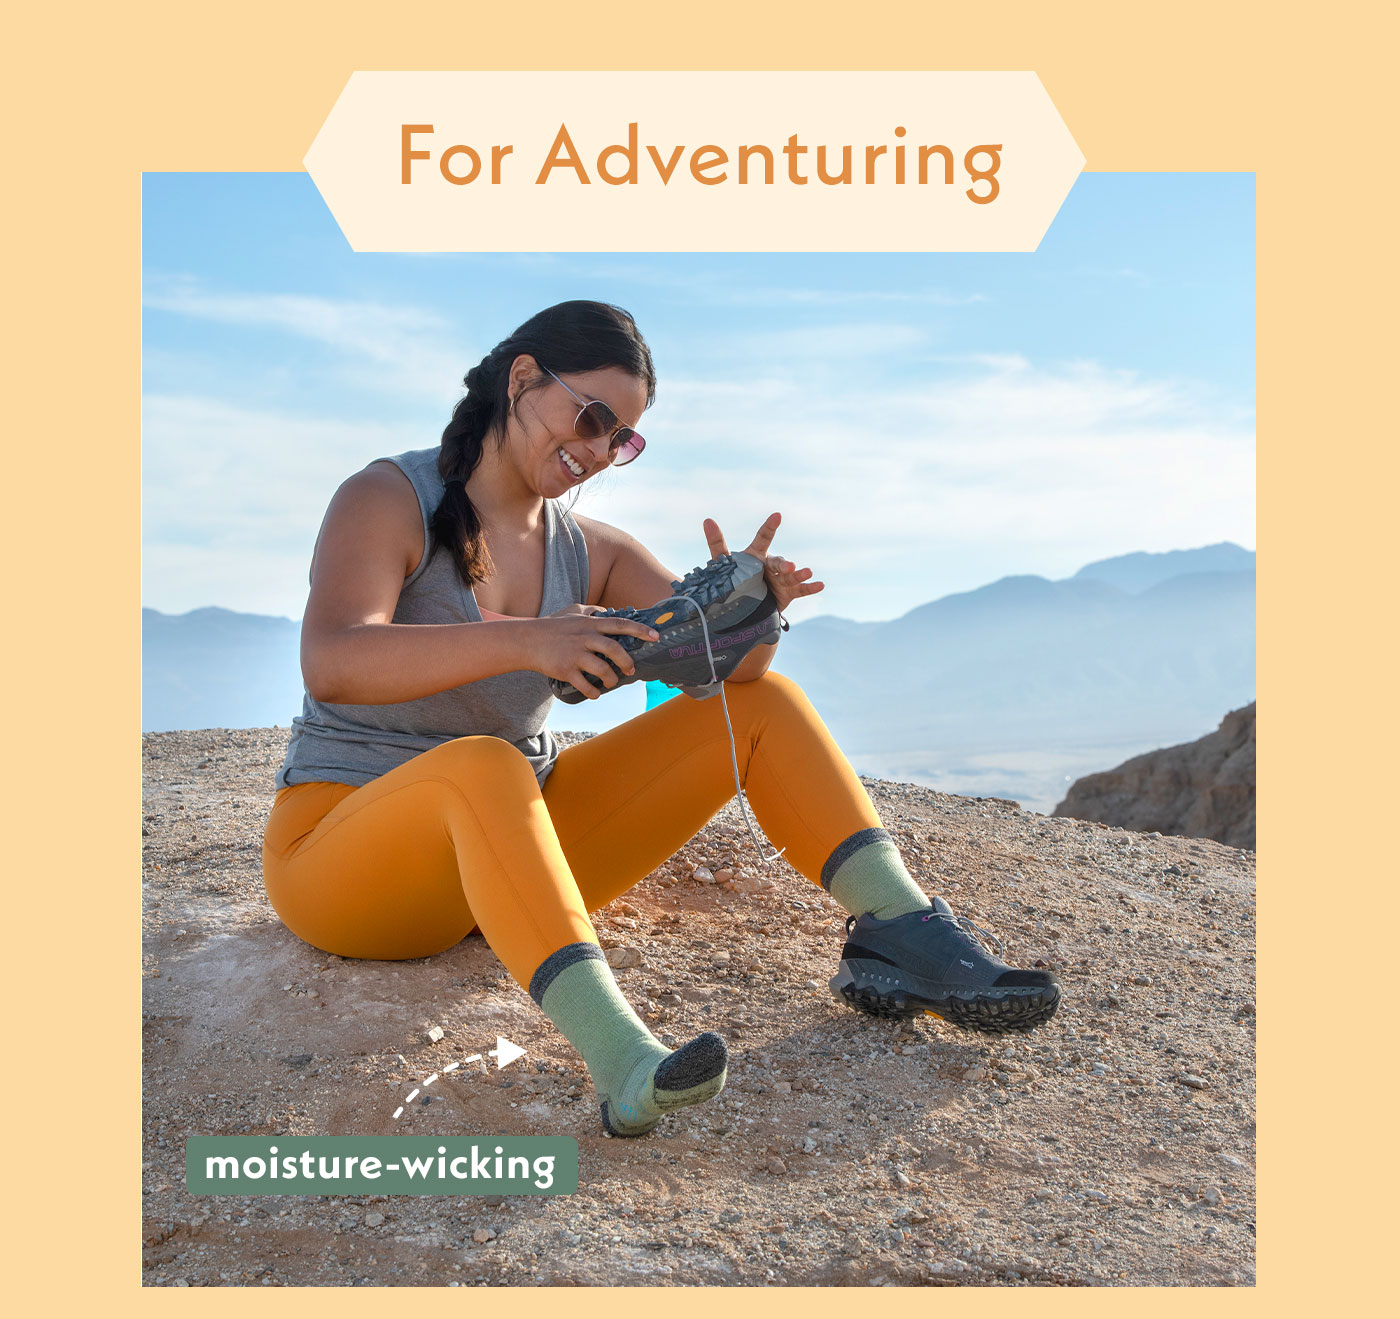 For Adventuring